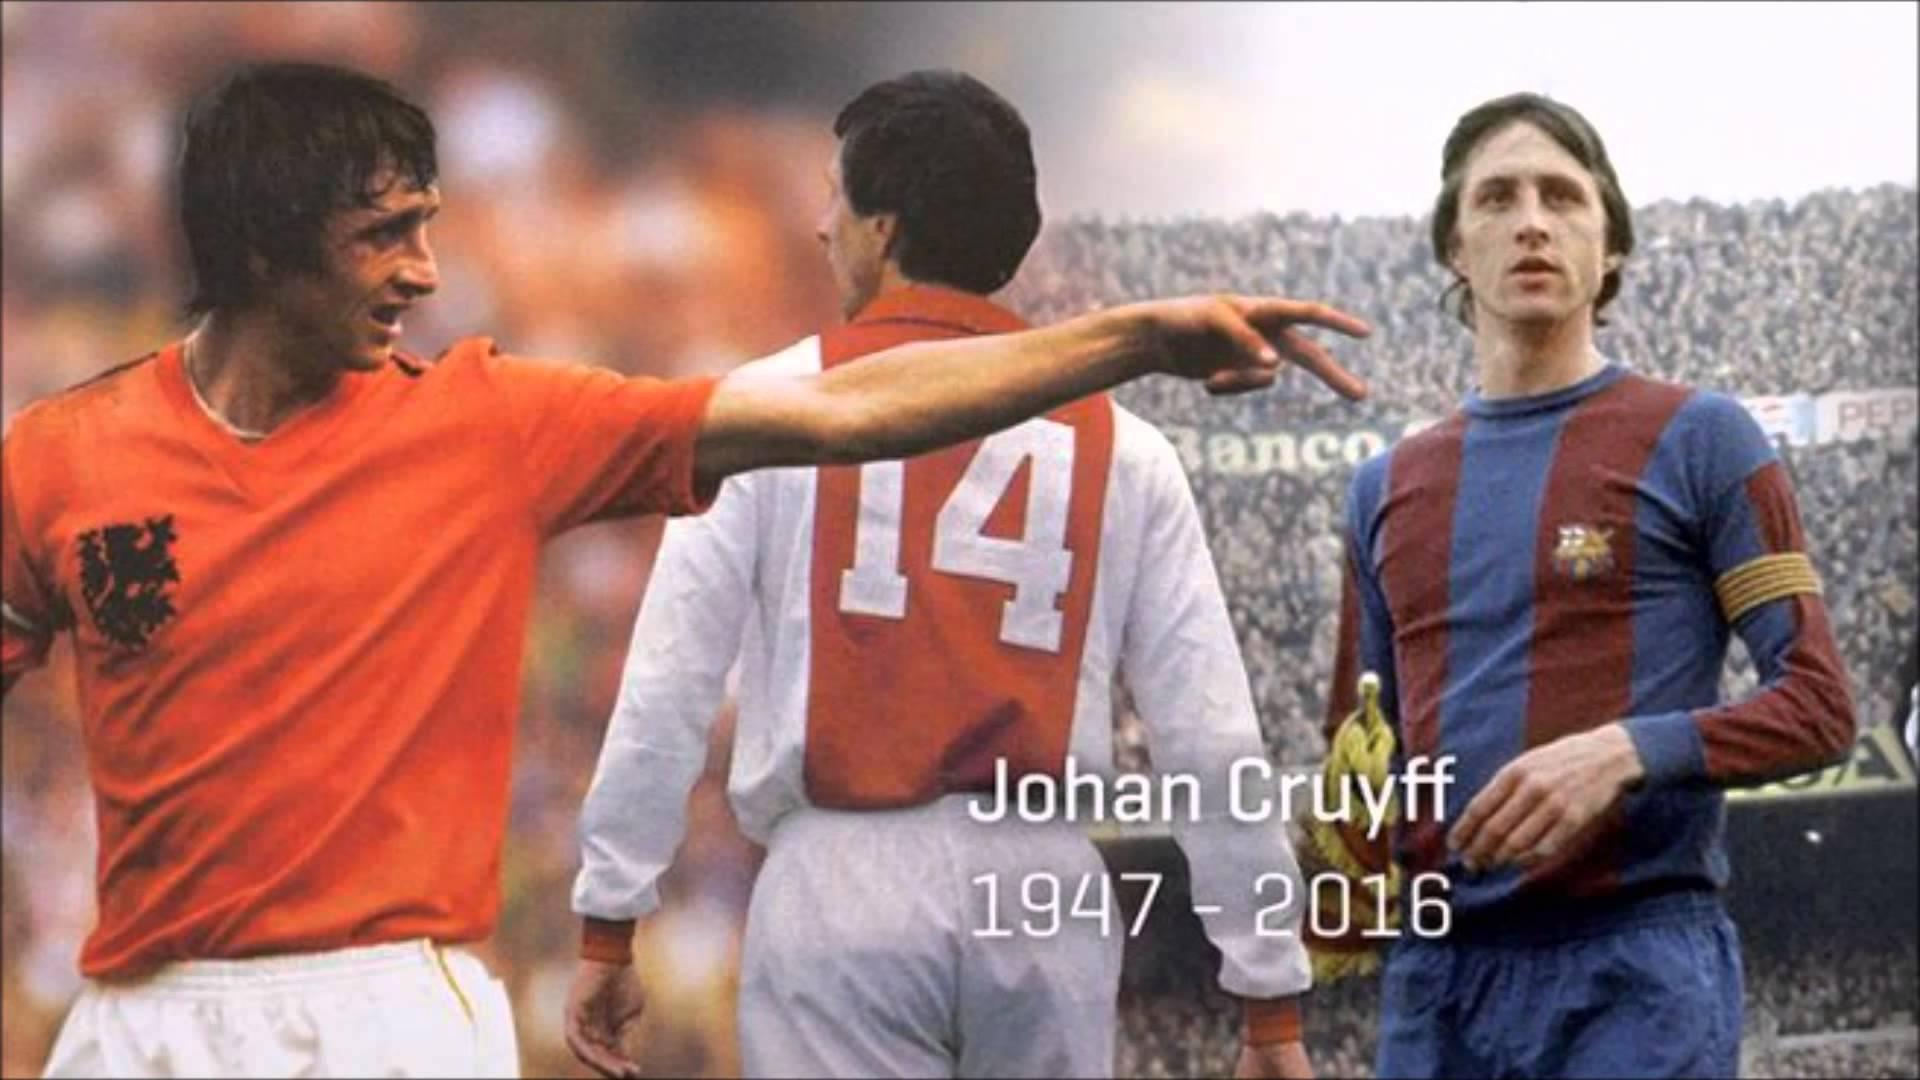 maglia 14 olanda CRUYFF